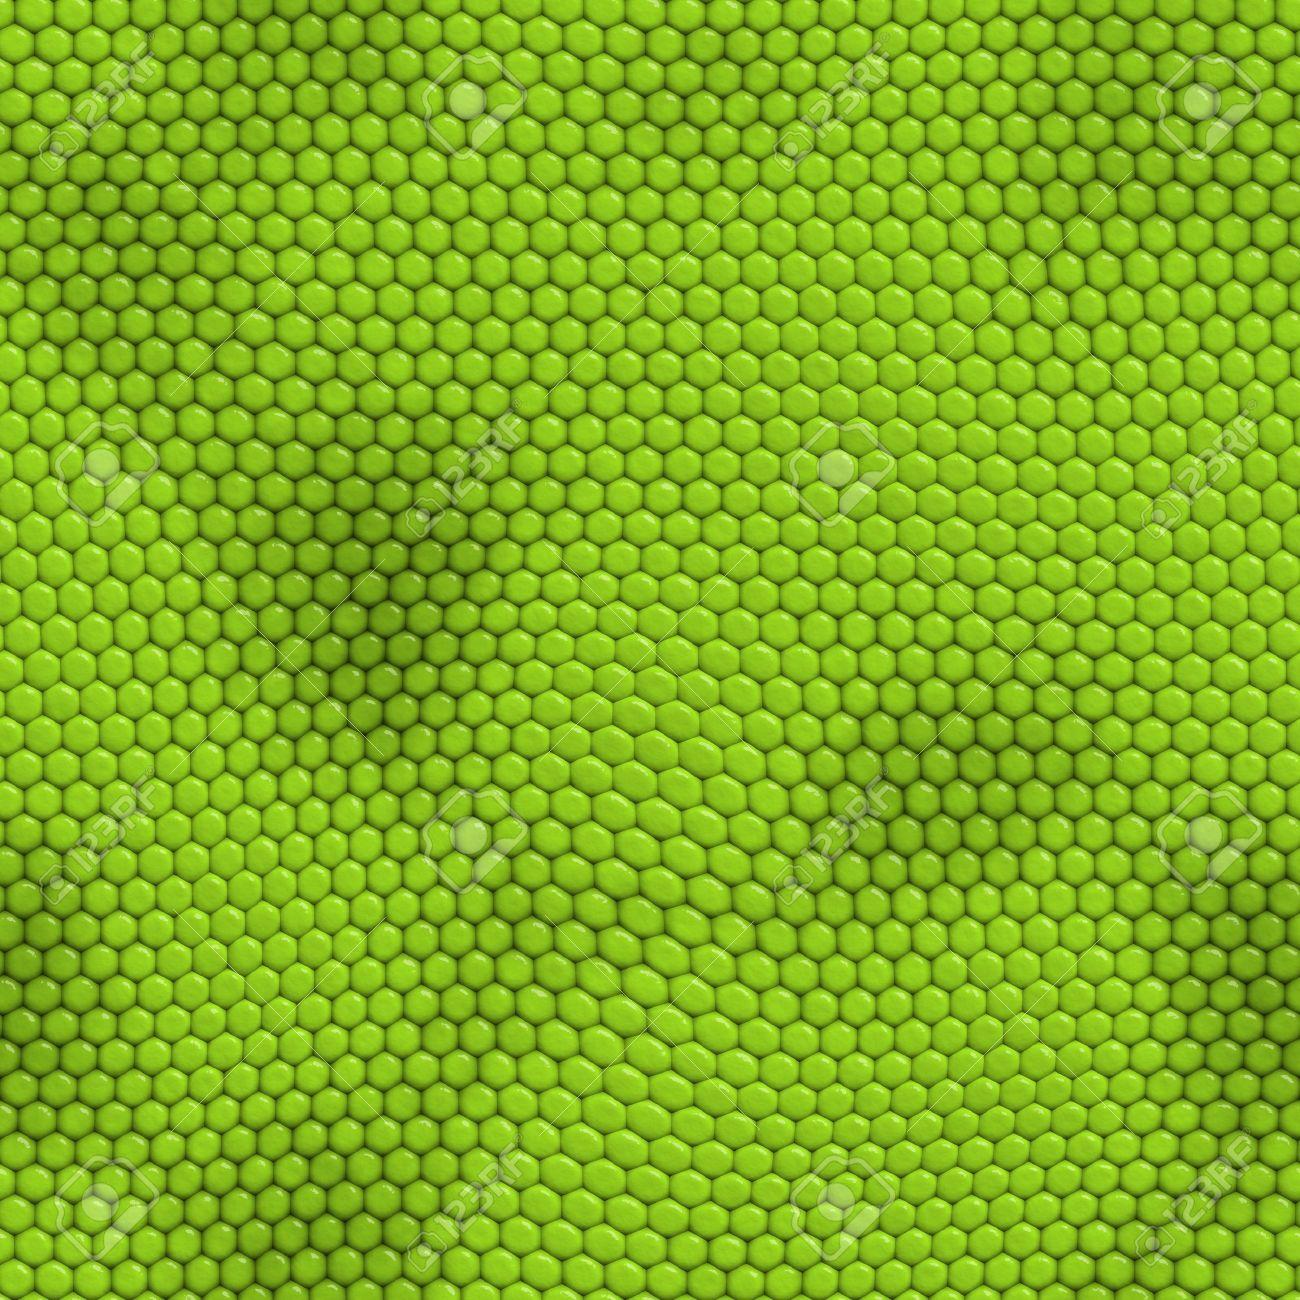 Seamless Iguana Skin Background Stock Photo - 3323407